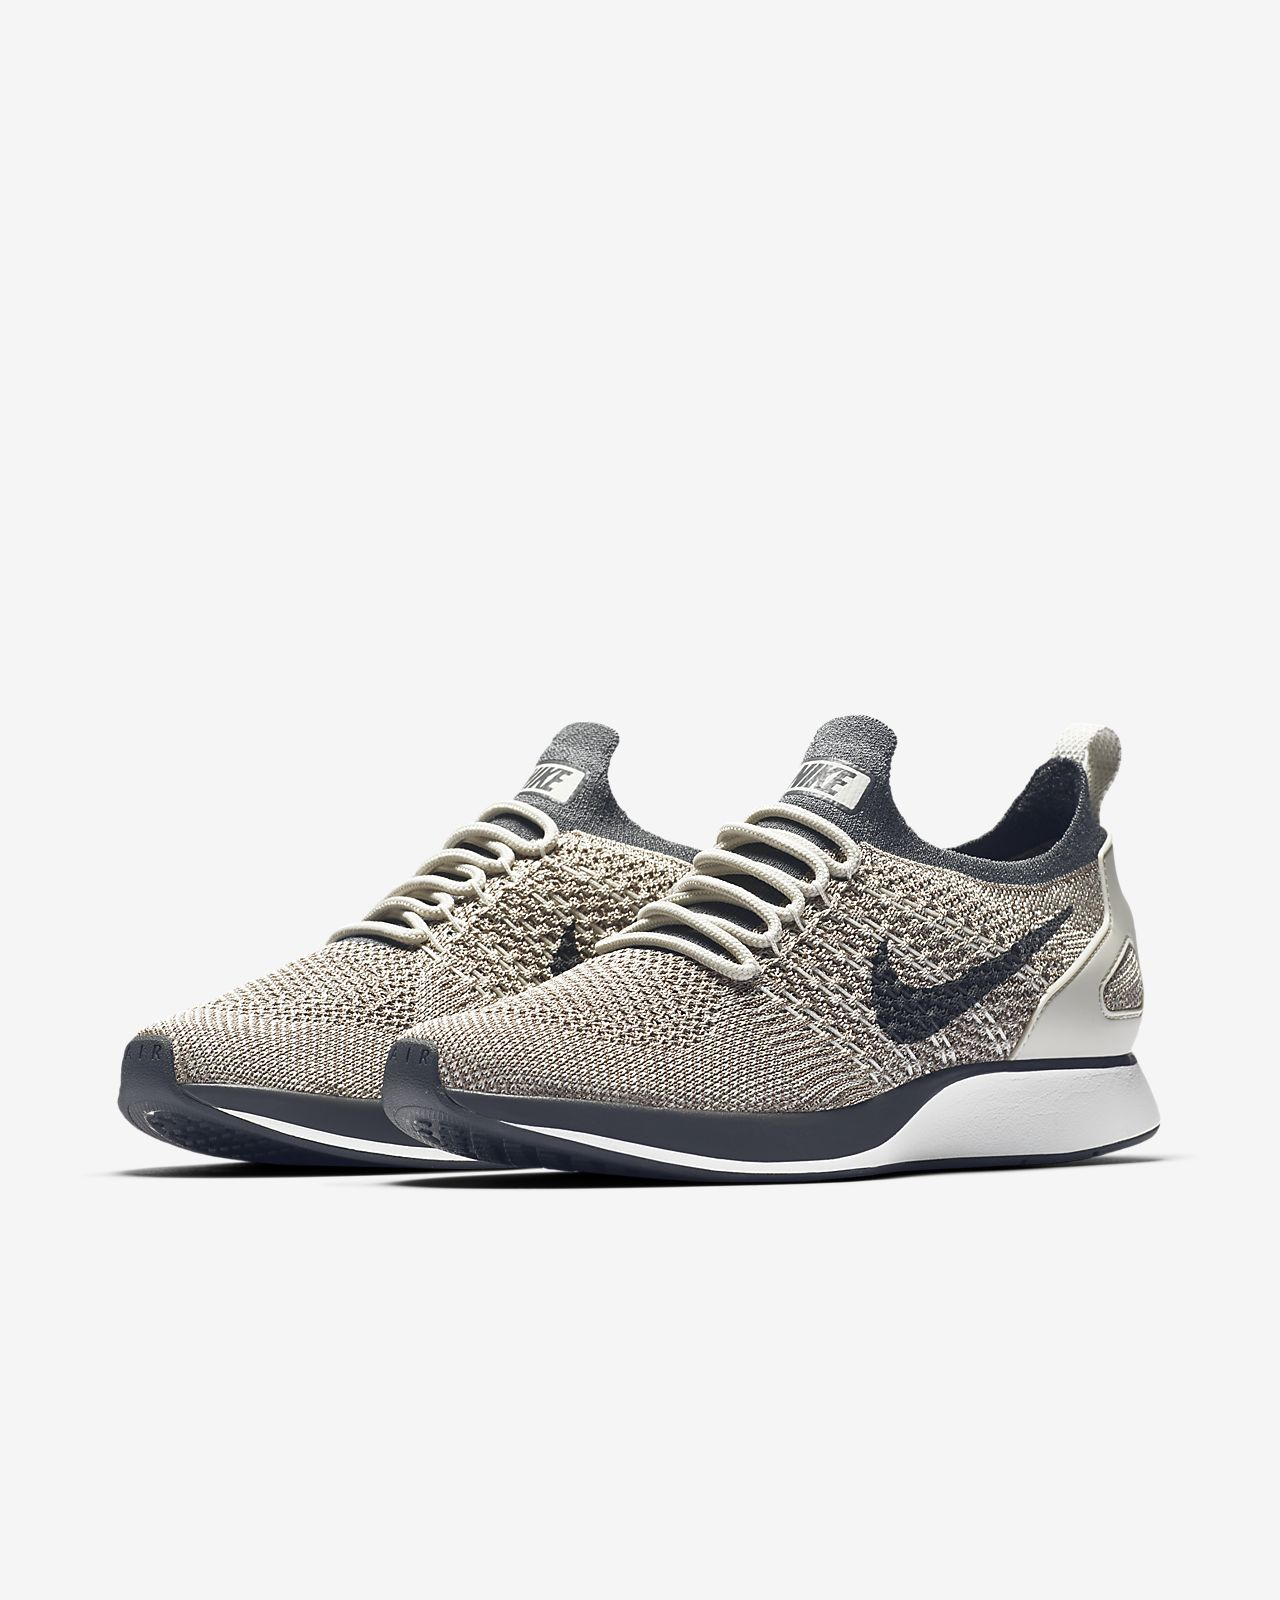 5c1bd60cd625 ... Nike Air Zoom Mariah Flyknit Racer Womens Shoe . ... Womens Nike Free  TR Focus Flyknit 844817-303 ...